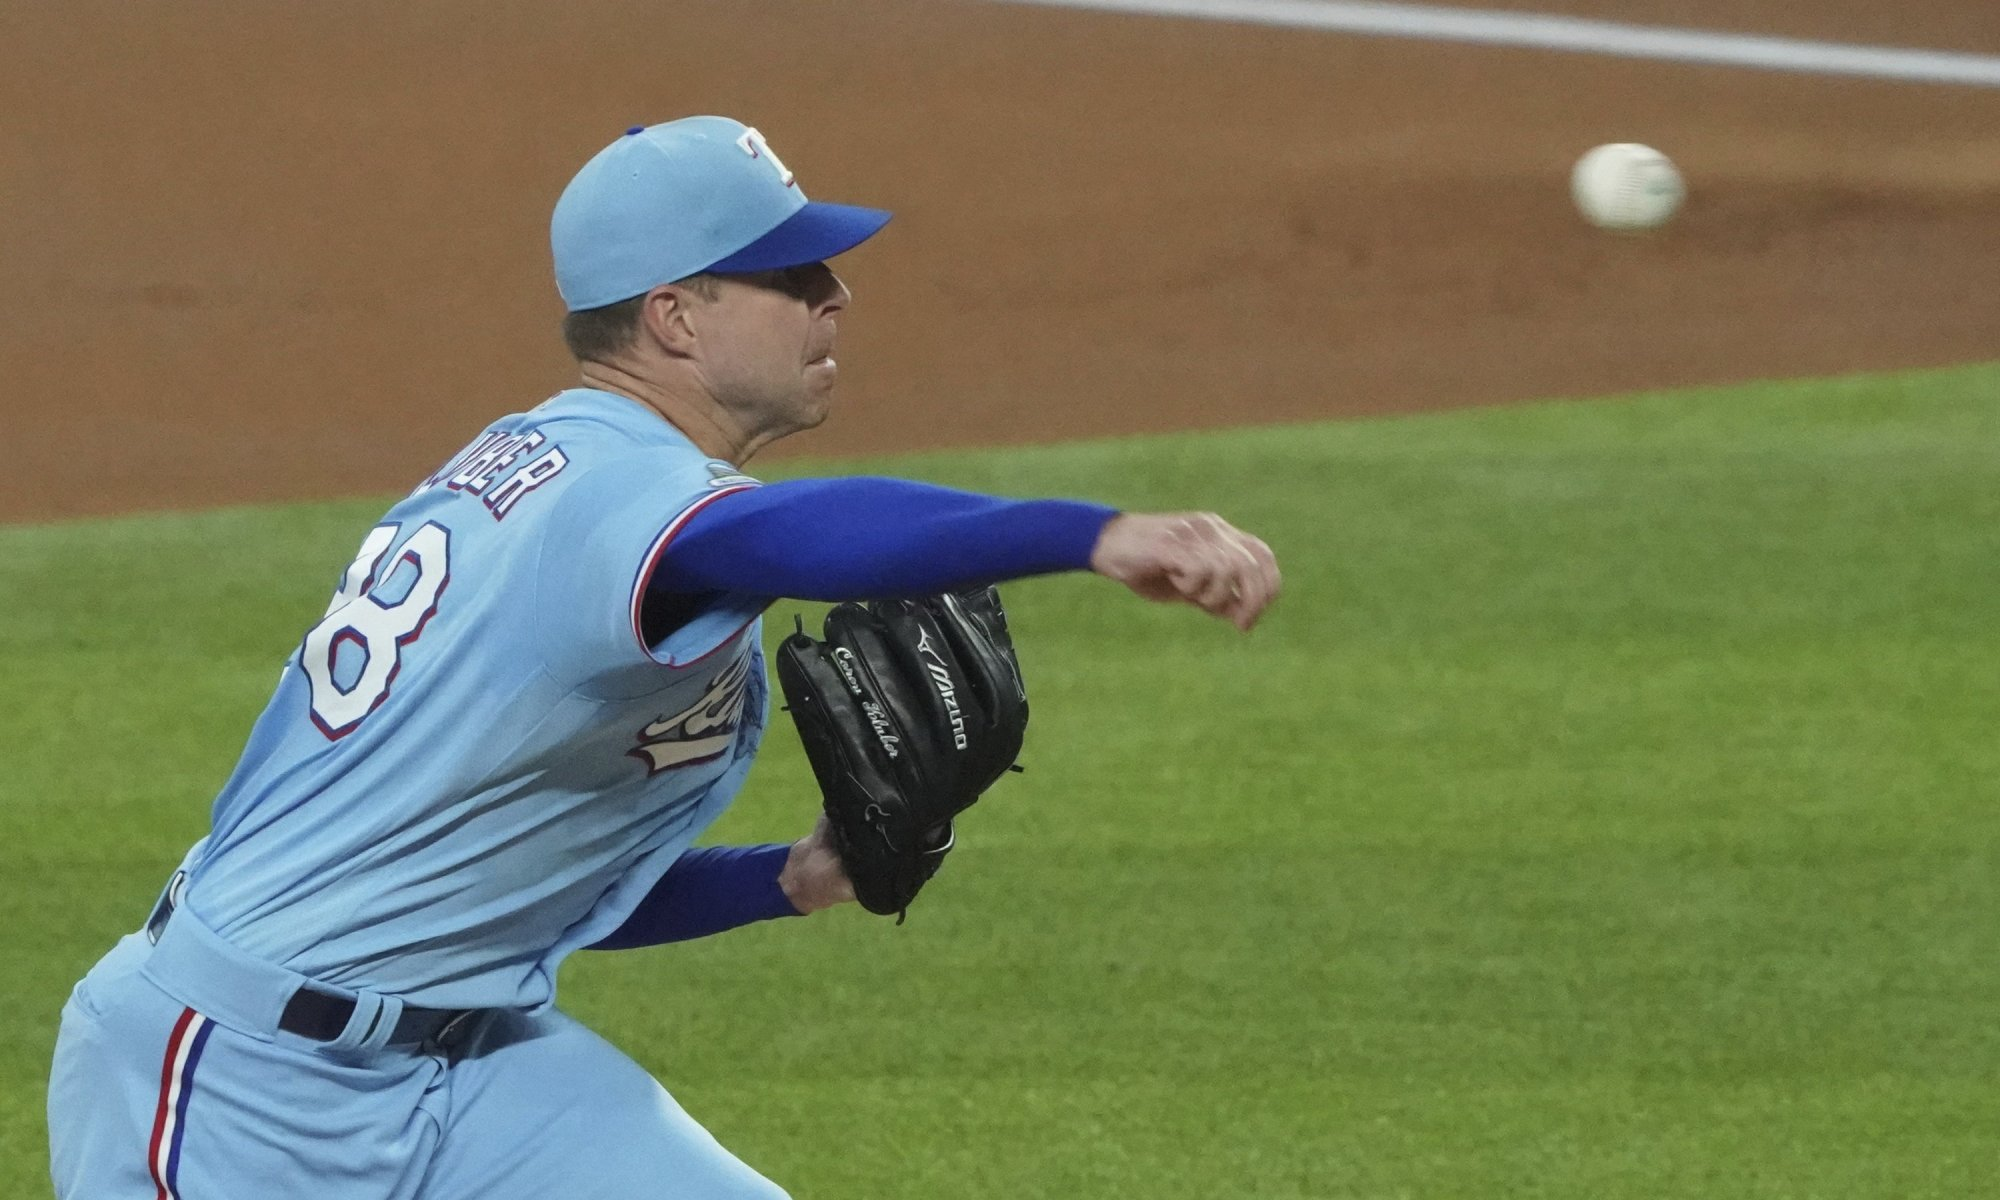 Should the Yankees target Corey Kluber?